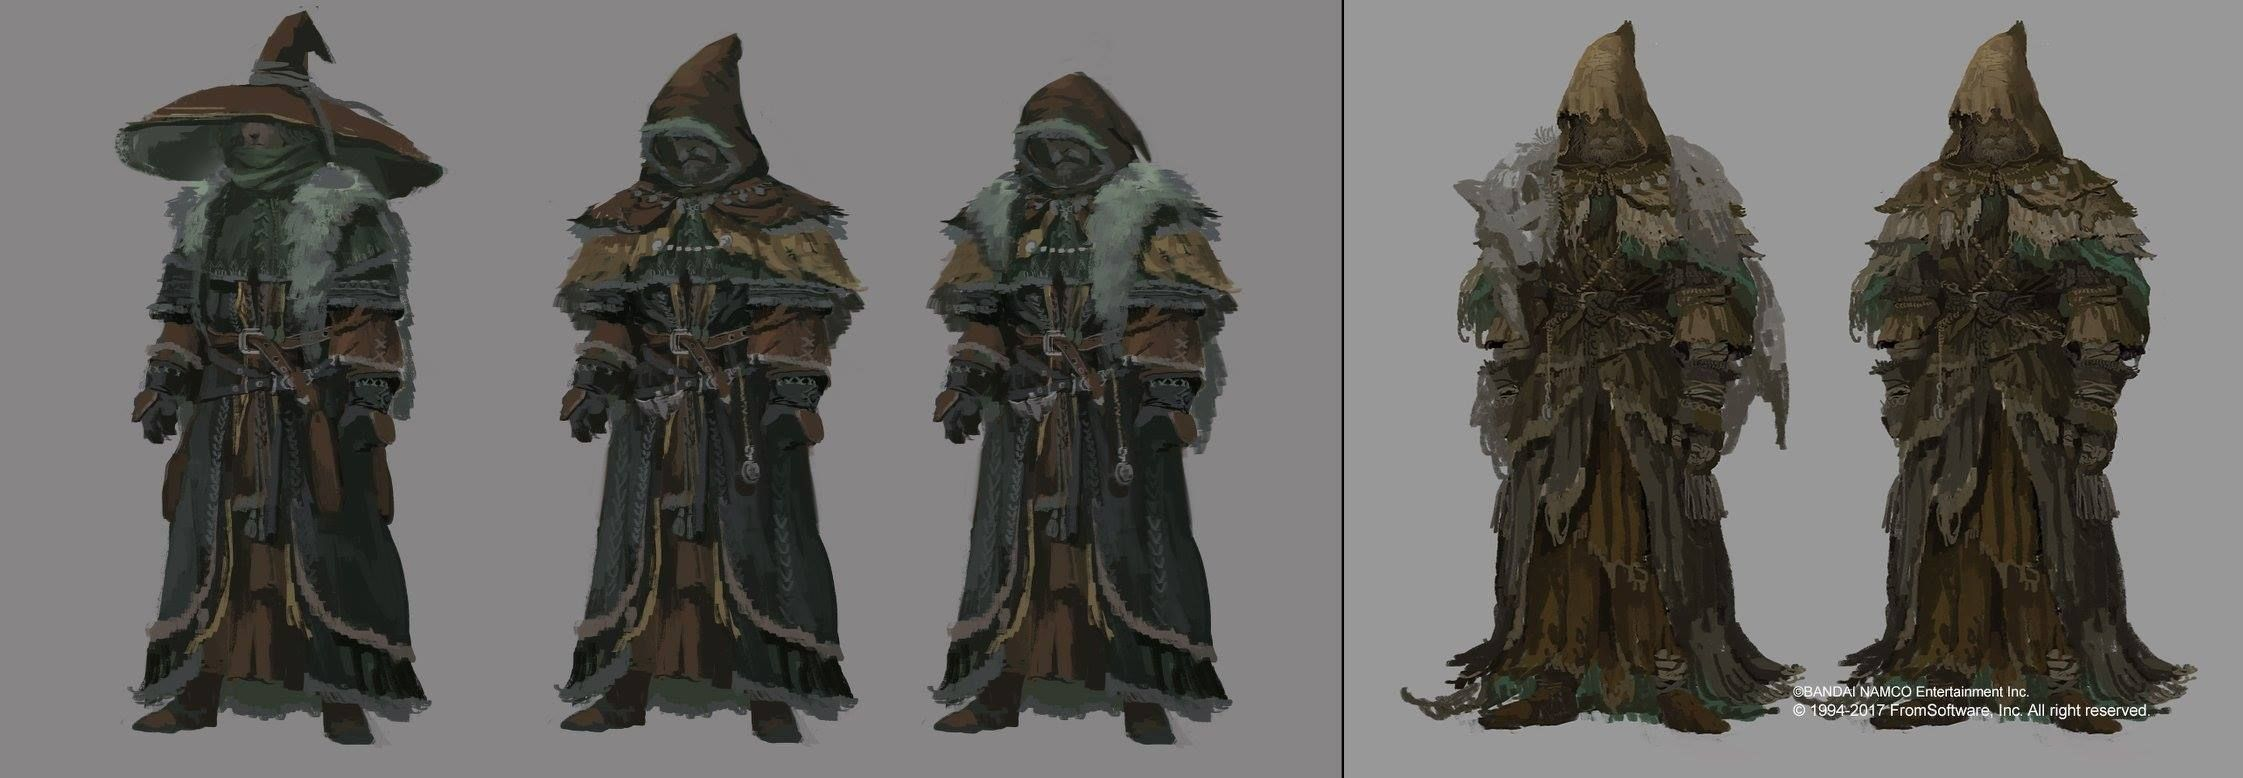 Michael Chang Dark Souls 2 Concept art! 哈!事隔幾年了才擺上網!...